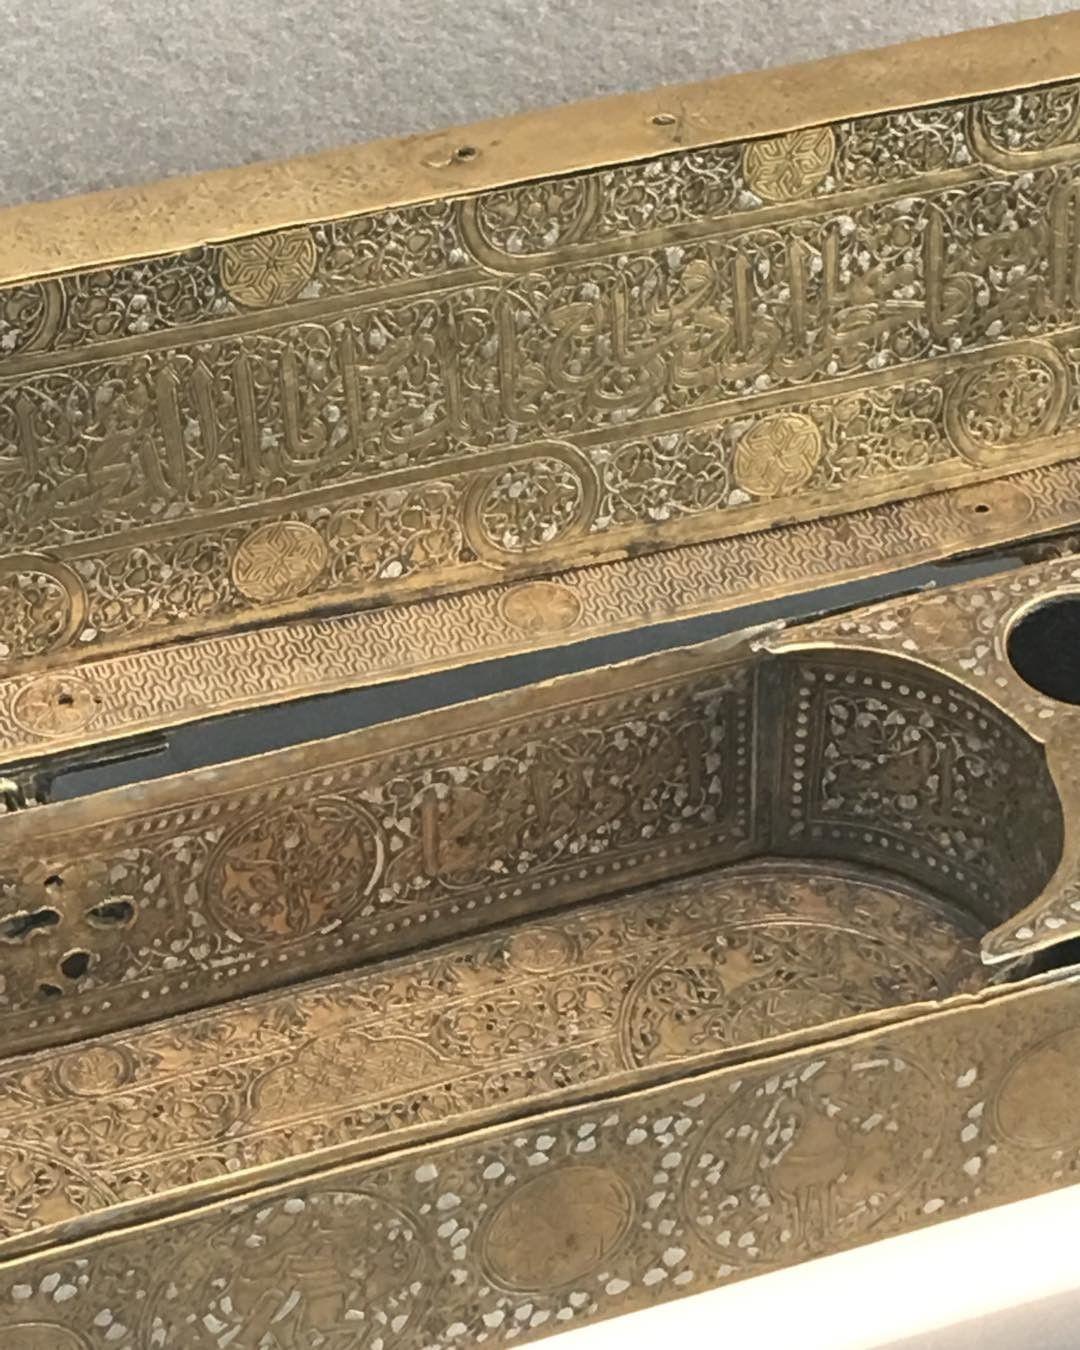 Khat Diwani Ajhalawani/Amr تفاصيل لحافظة الأقلام #متحف_اللوفر #باريس #فرنسا #الخط_العربي… 33